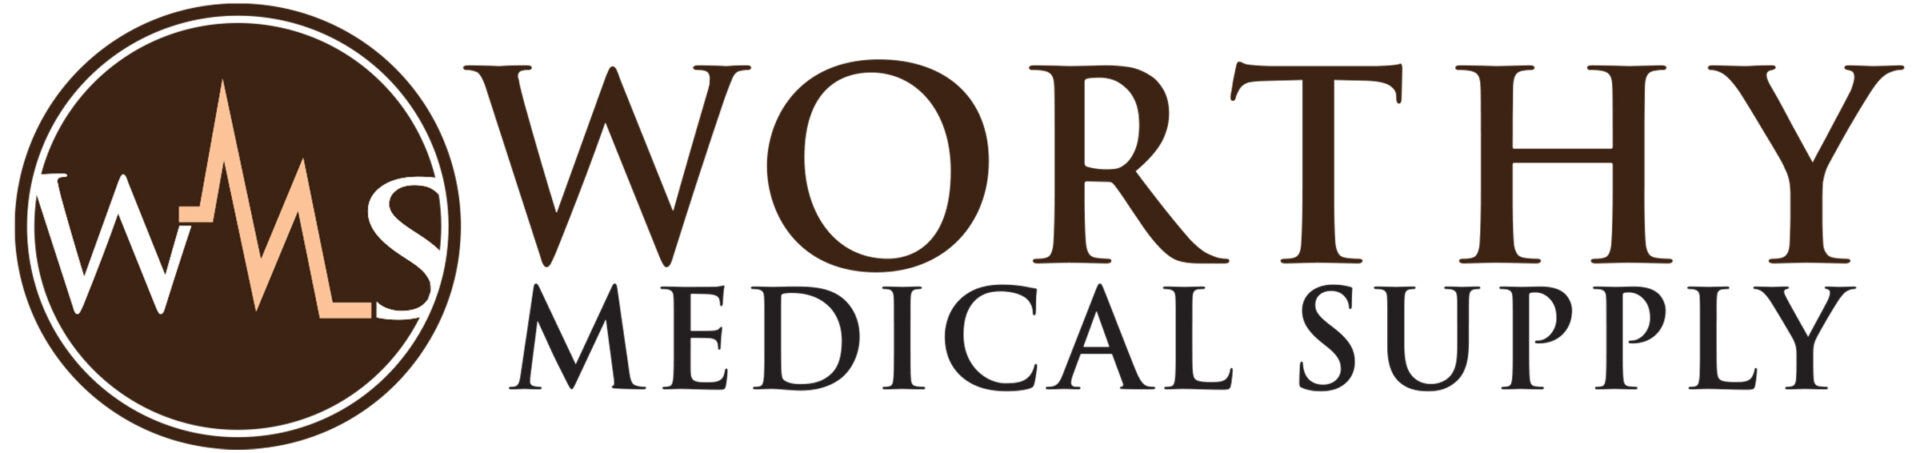 worthlymedicalsupply-horizontal-update